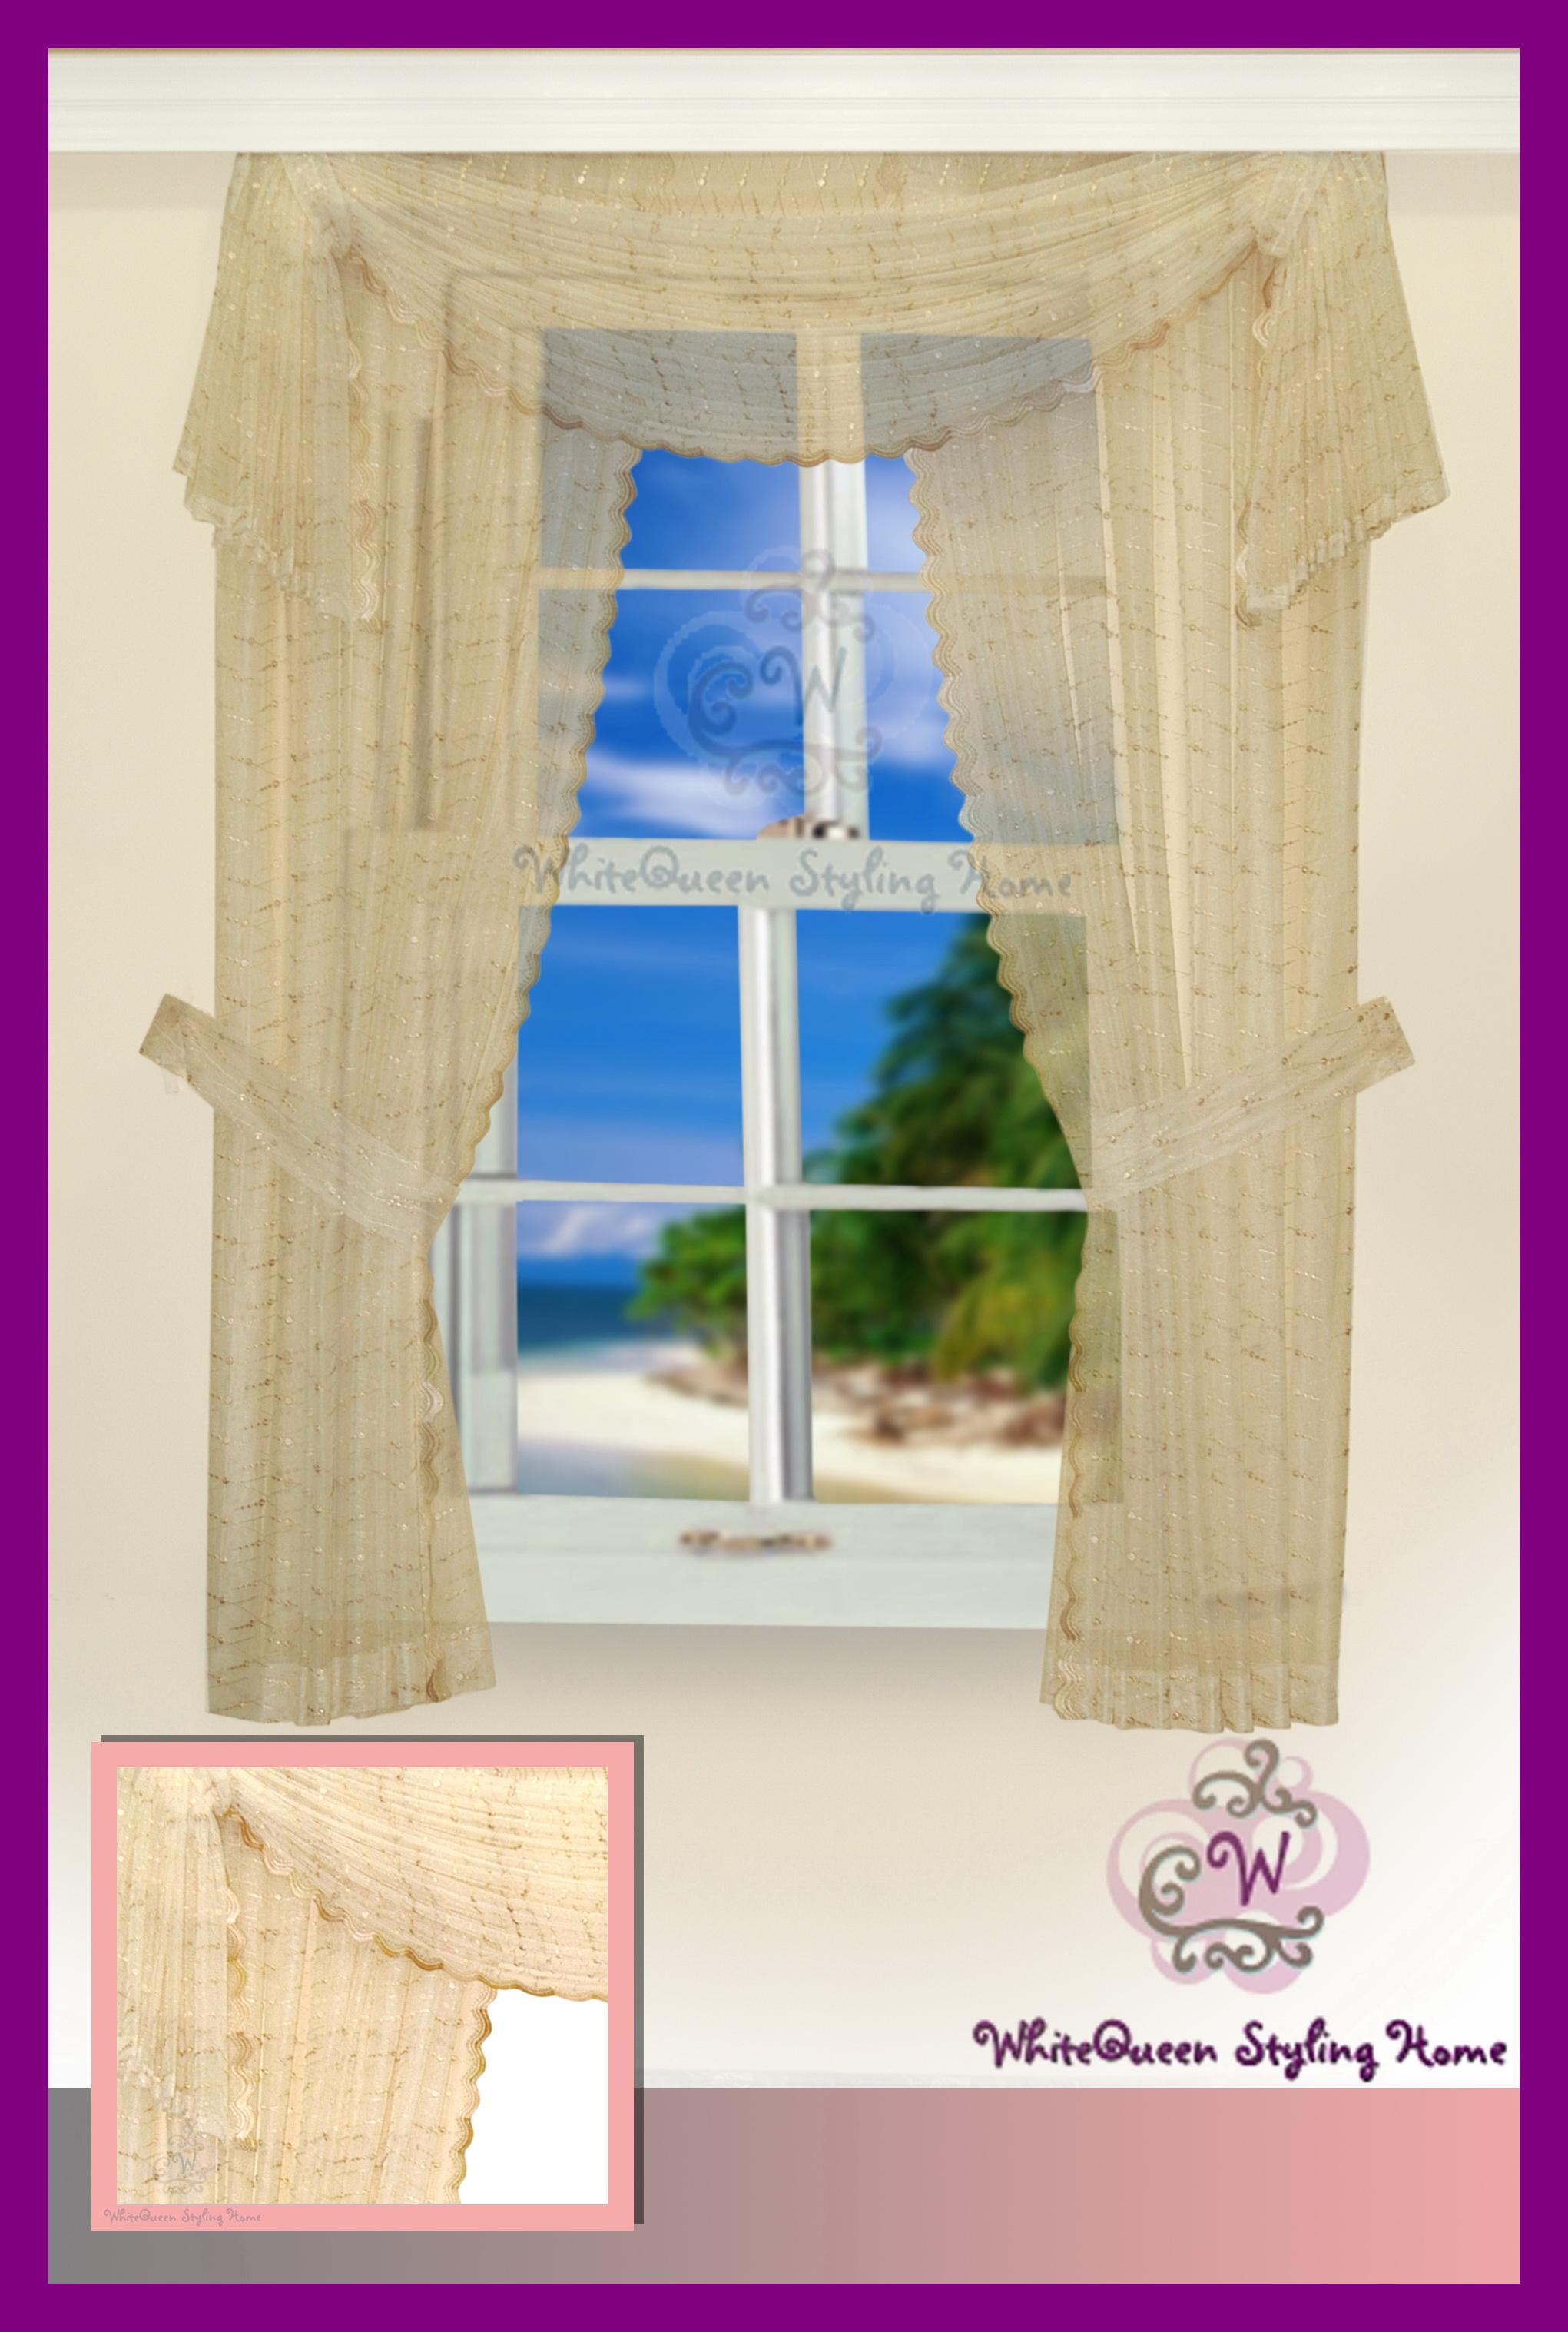 gardinen set querbehang rosen stickerei spitze 250x220. Black Bedroom Furniture Sets. Home Design Ideas